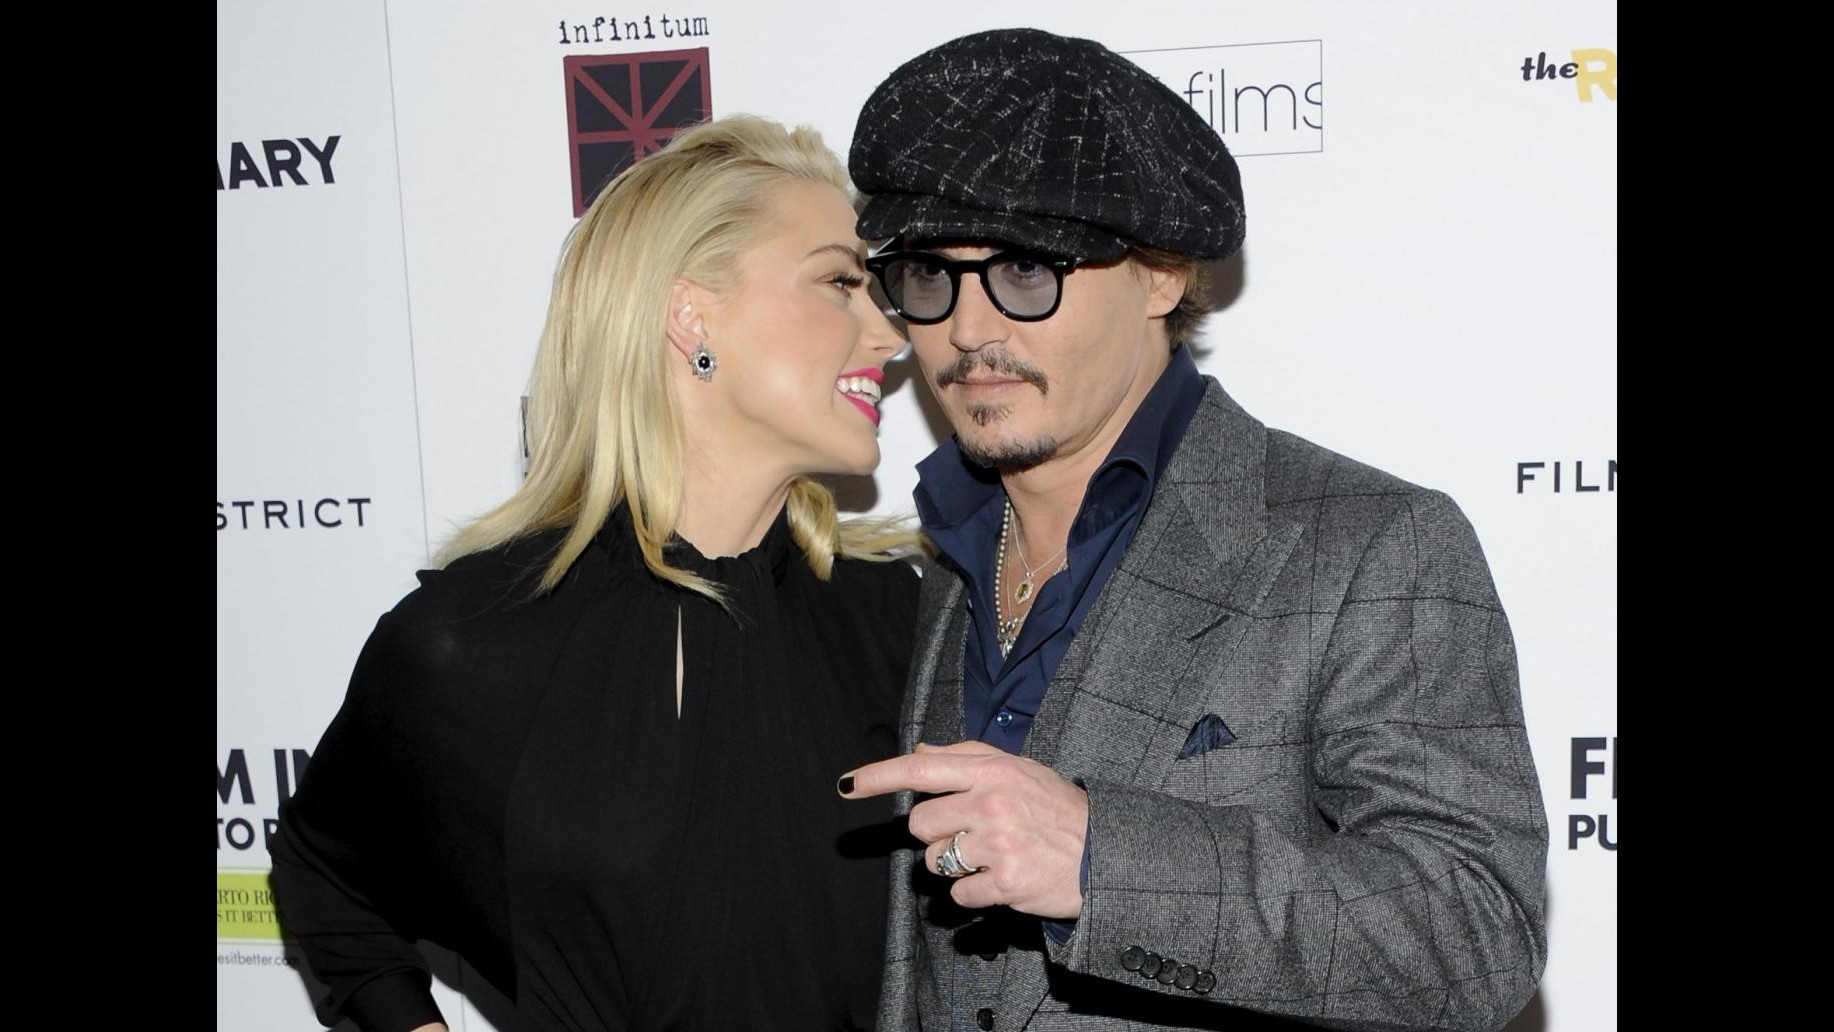 Johnny Depp e Amber Heard verso le nozze: cerimonia intima alle Bahamas